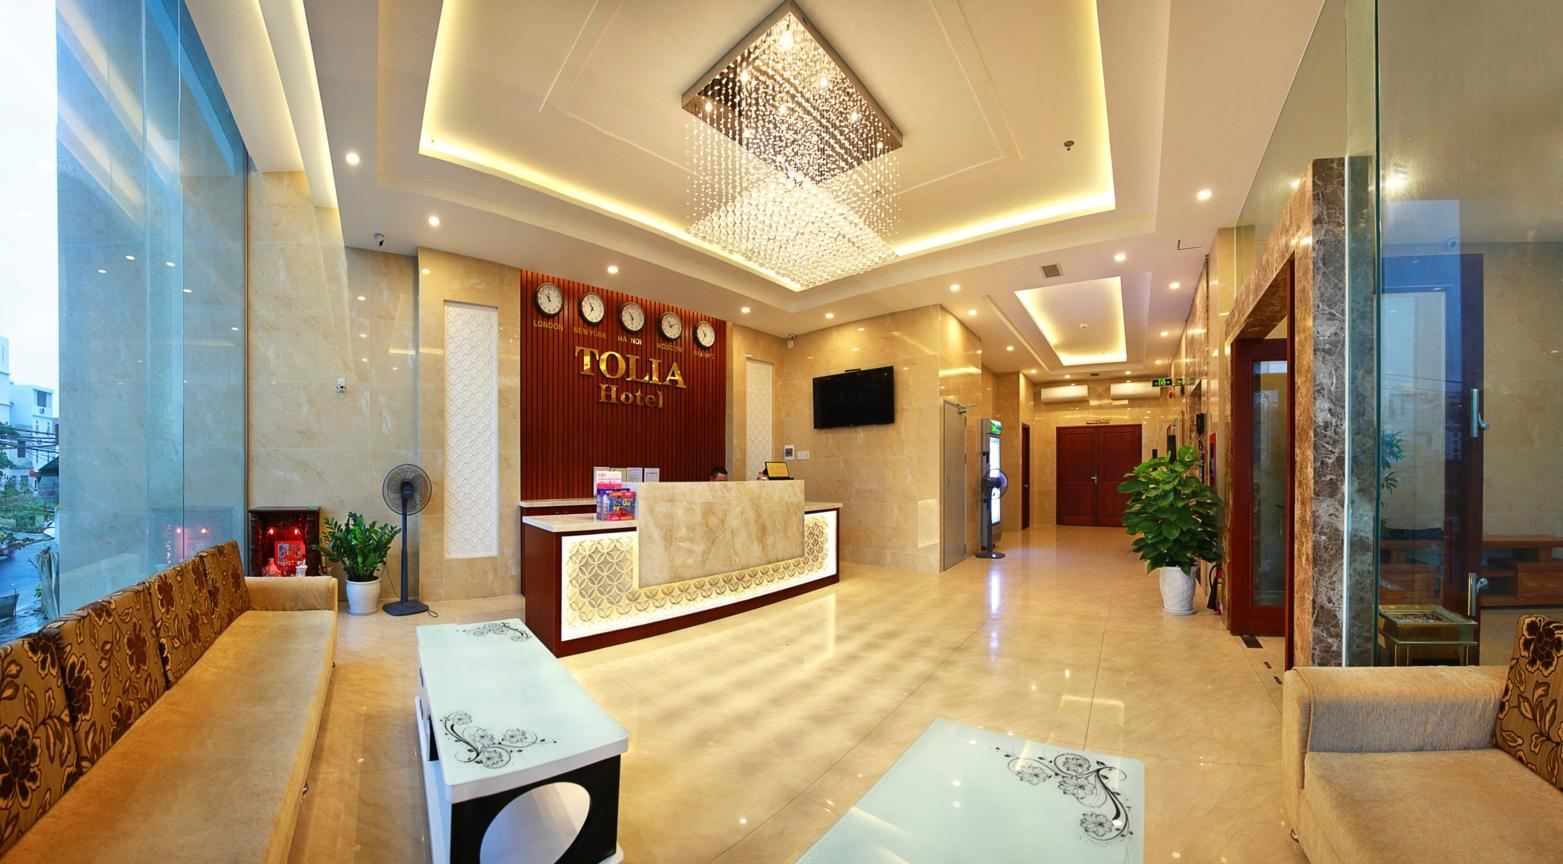 Tolia Hotel